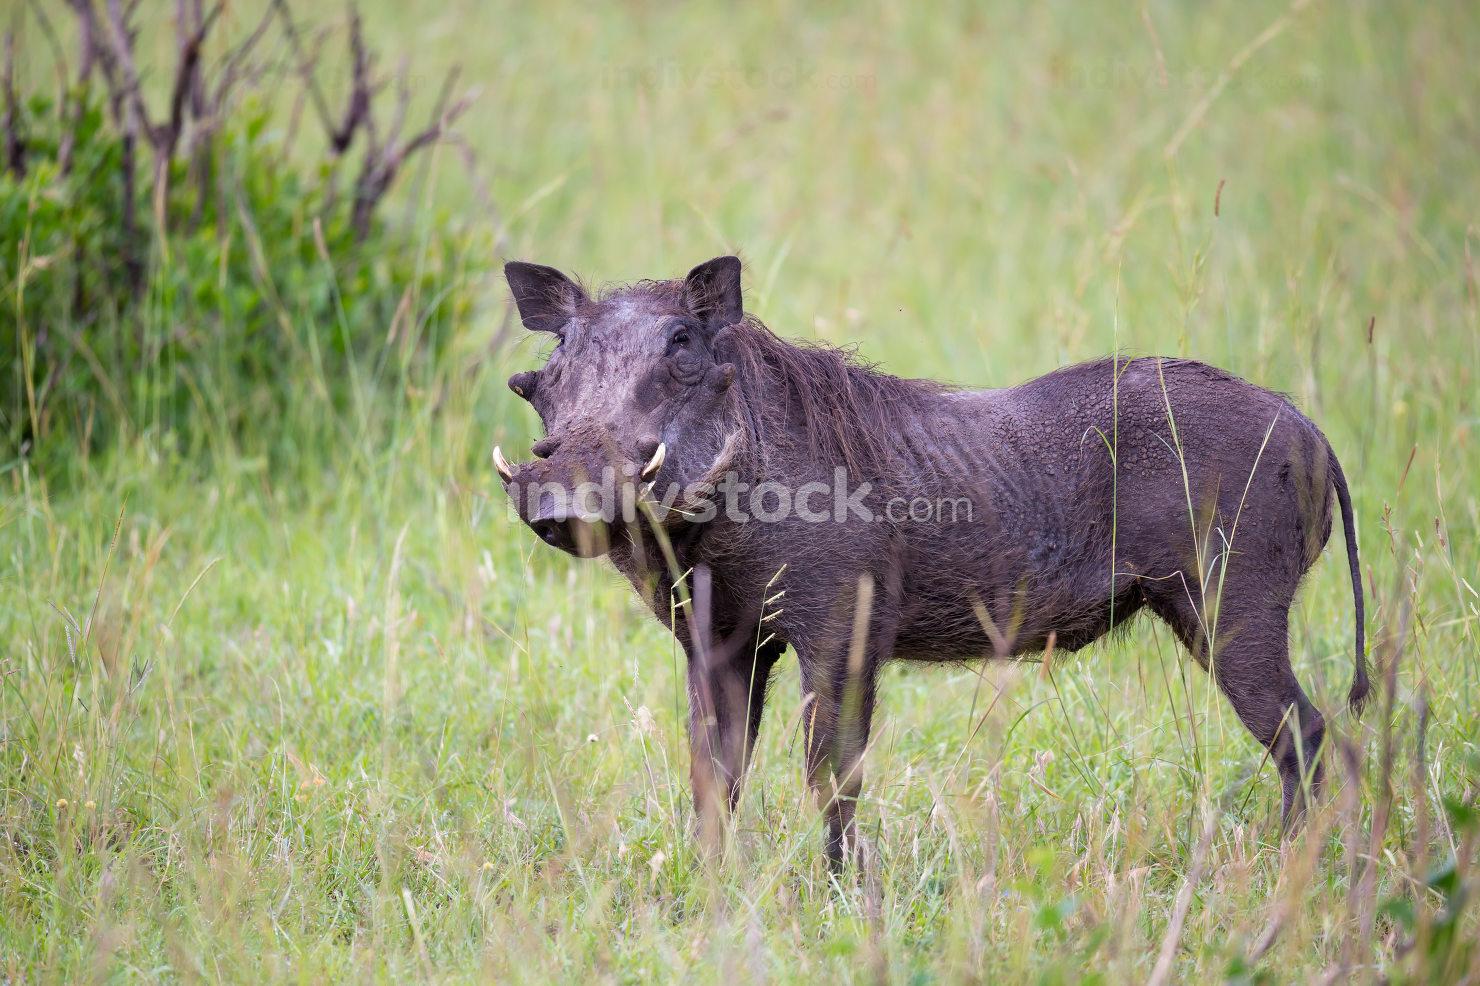 Warthogs are grazing in the savannah of Kenya